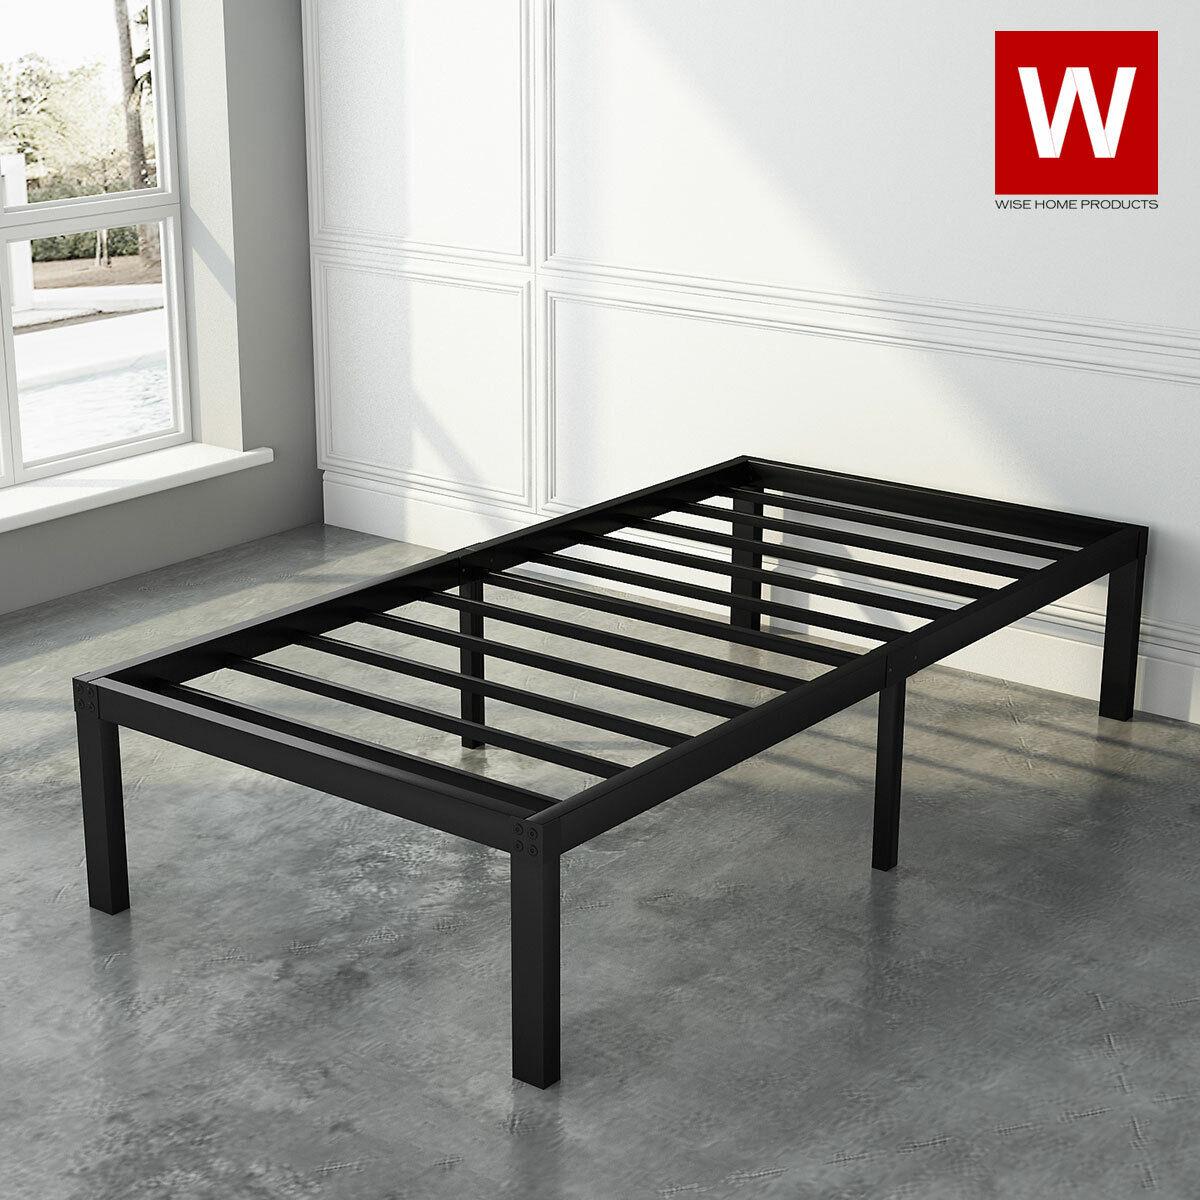 Twin Steel Bed Frame Metal Platform Beds with Heavy Duty Ste